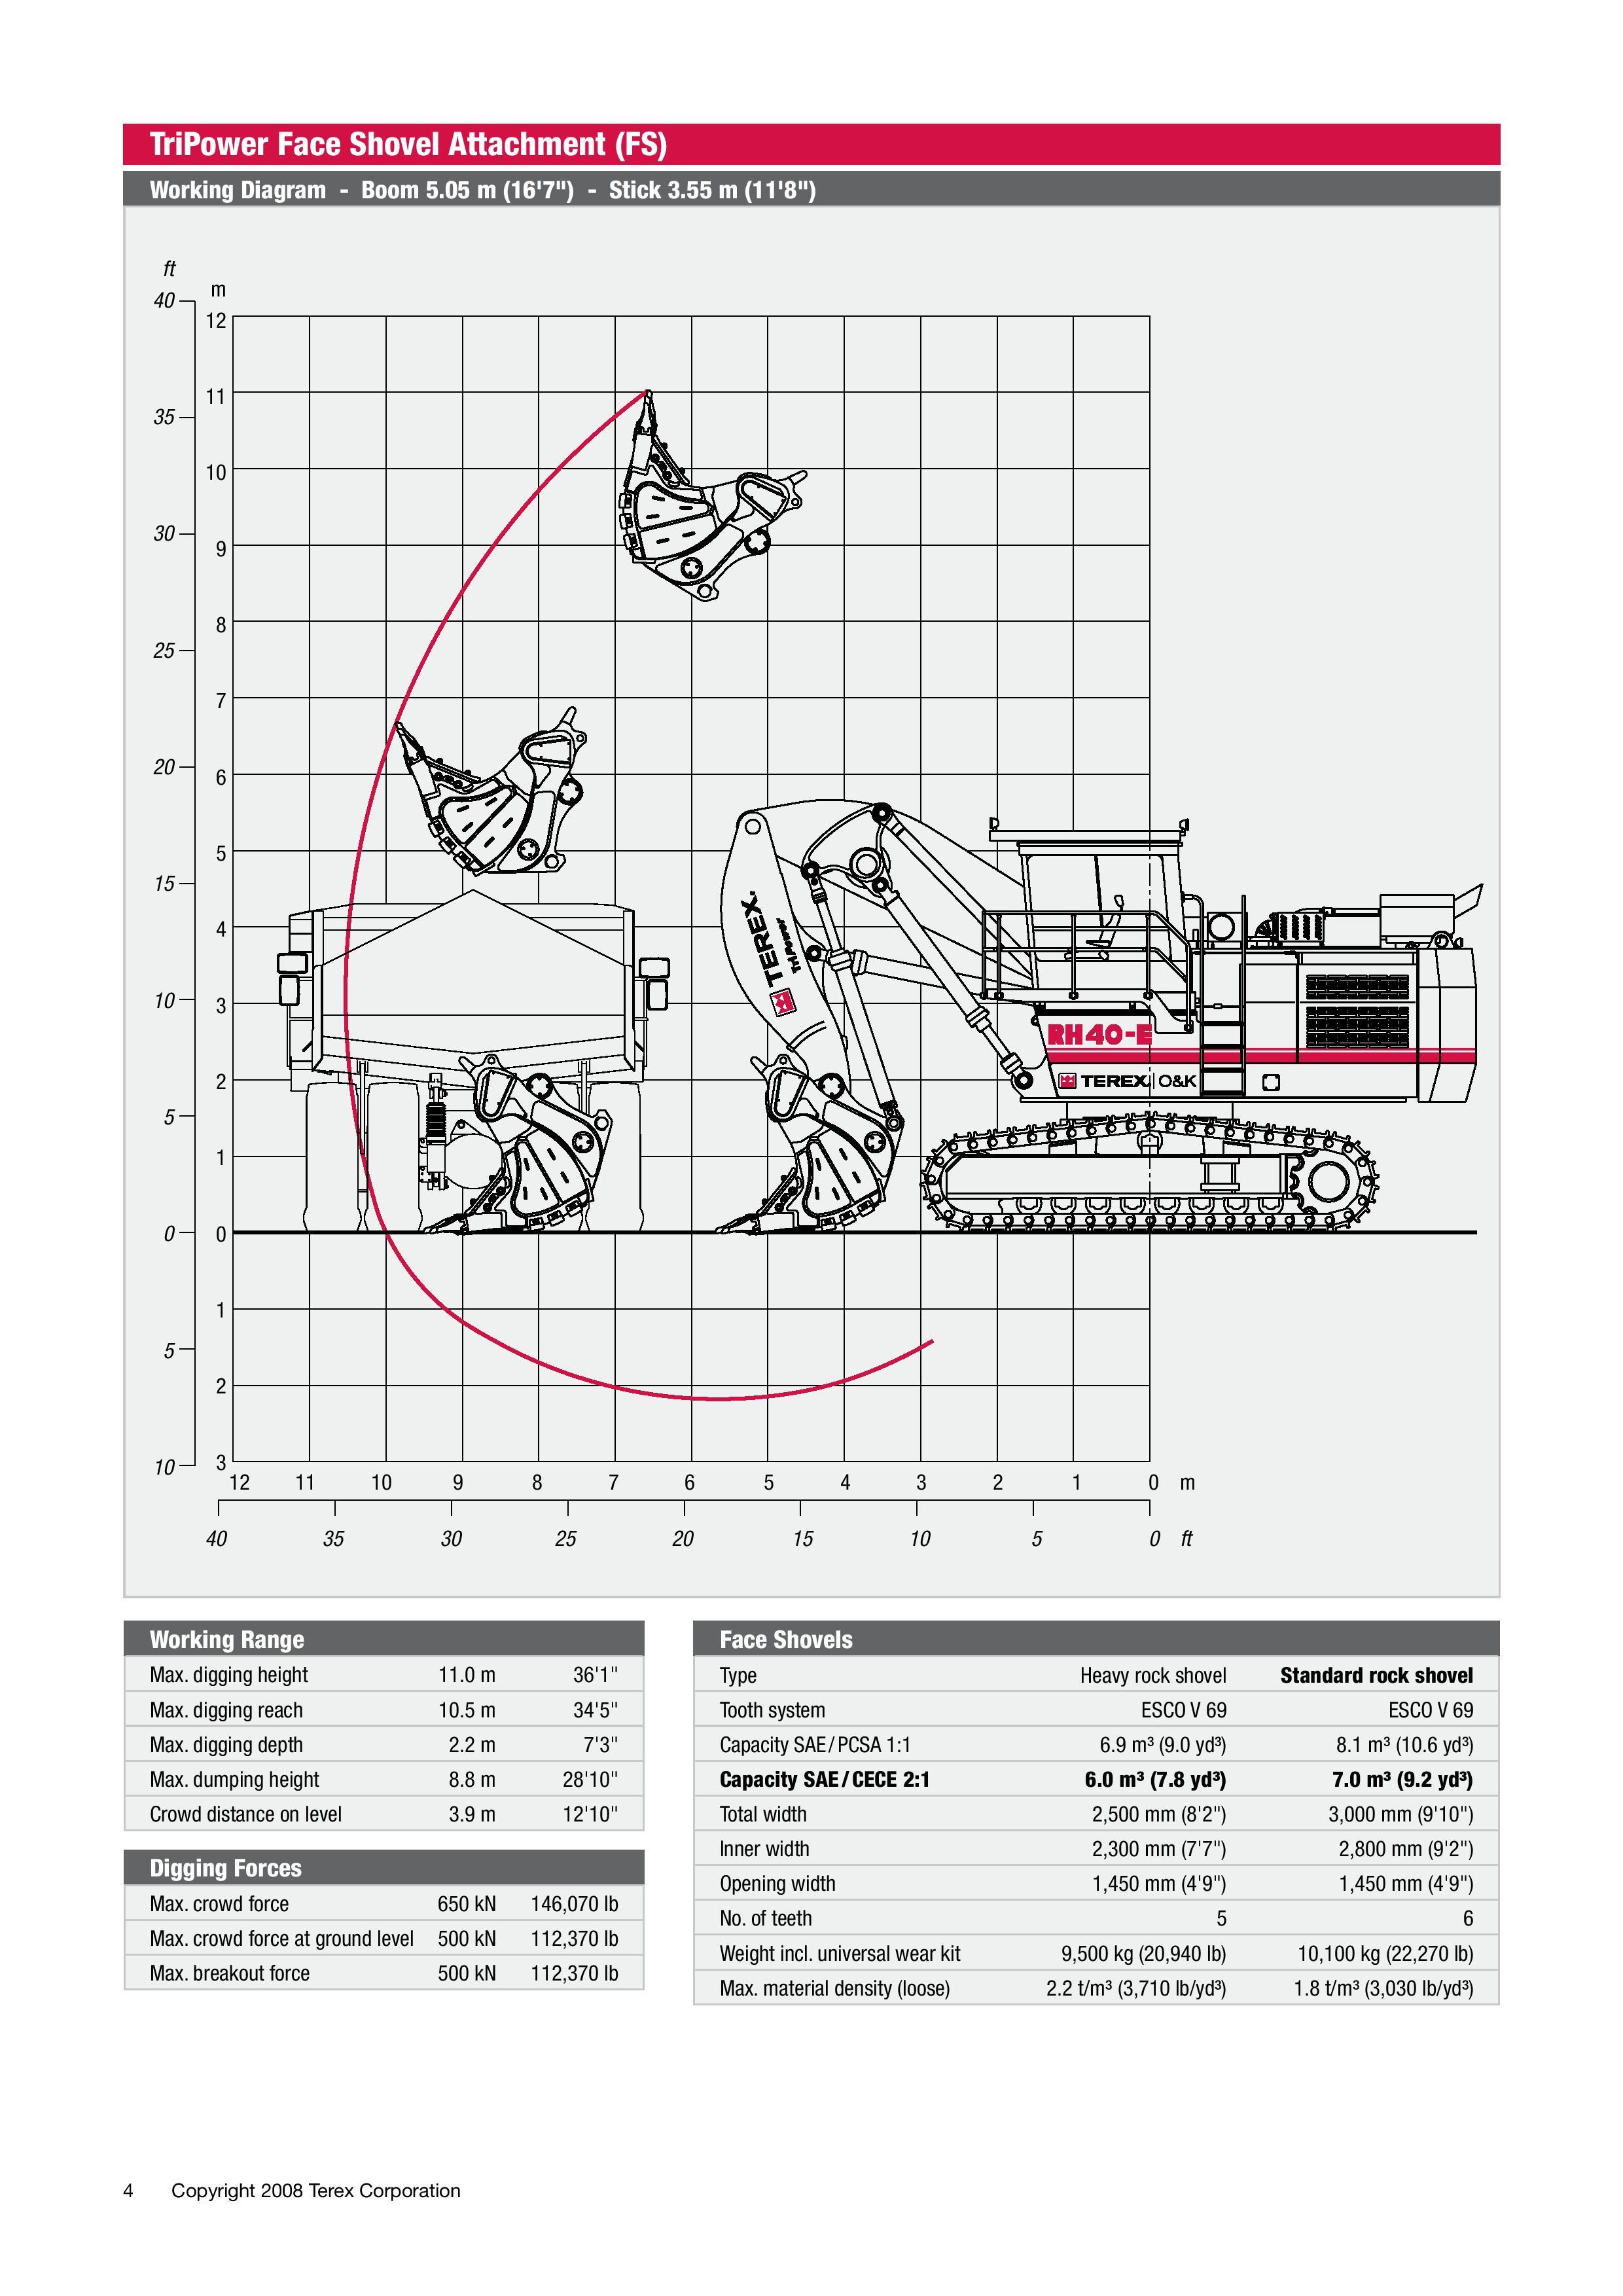 Used Rh40 E Face Shovel Excavator For Sale